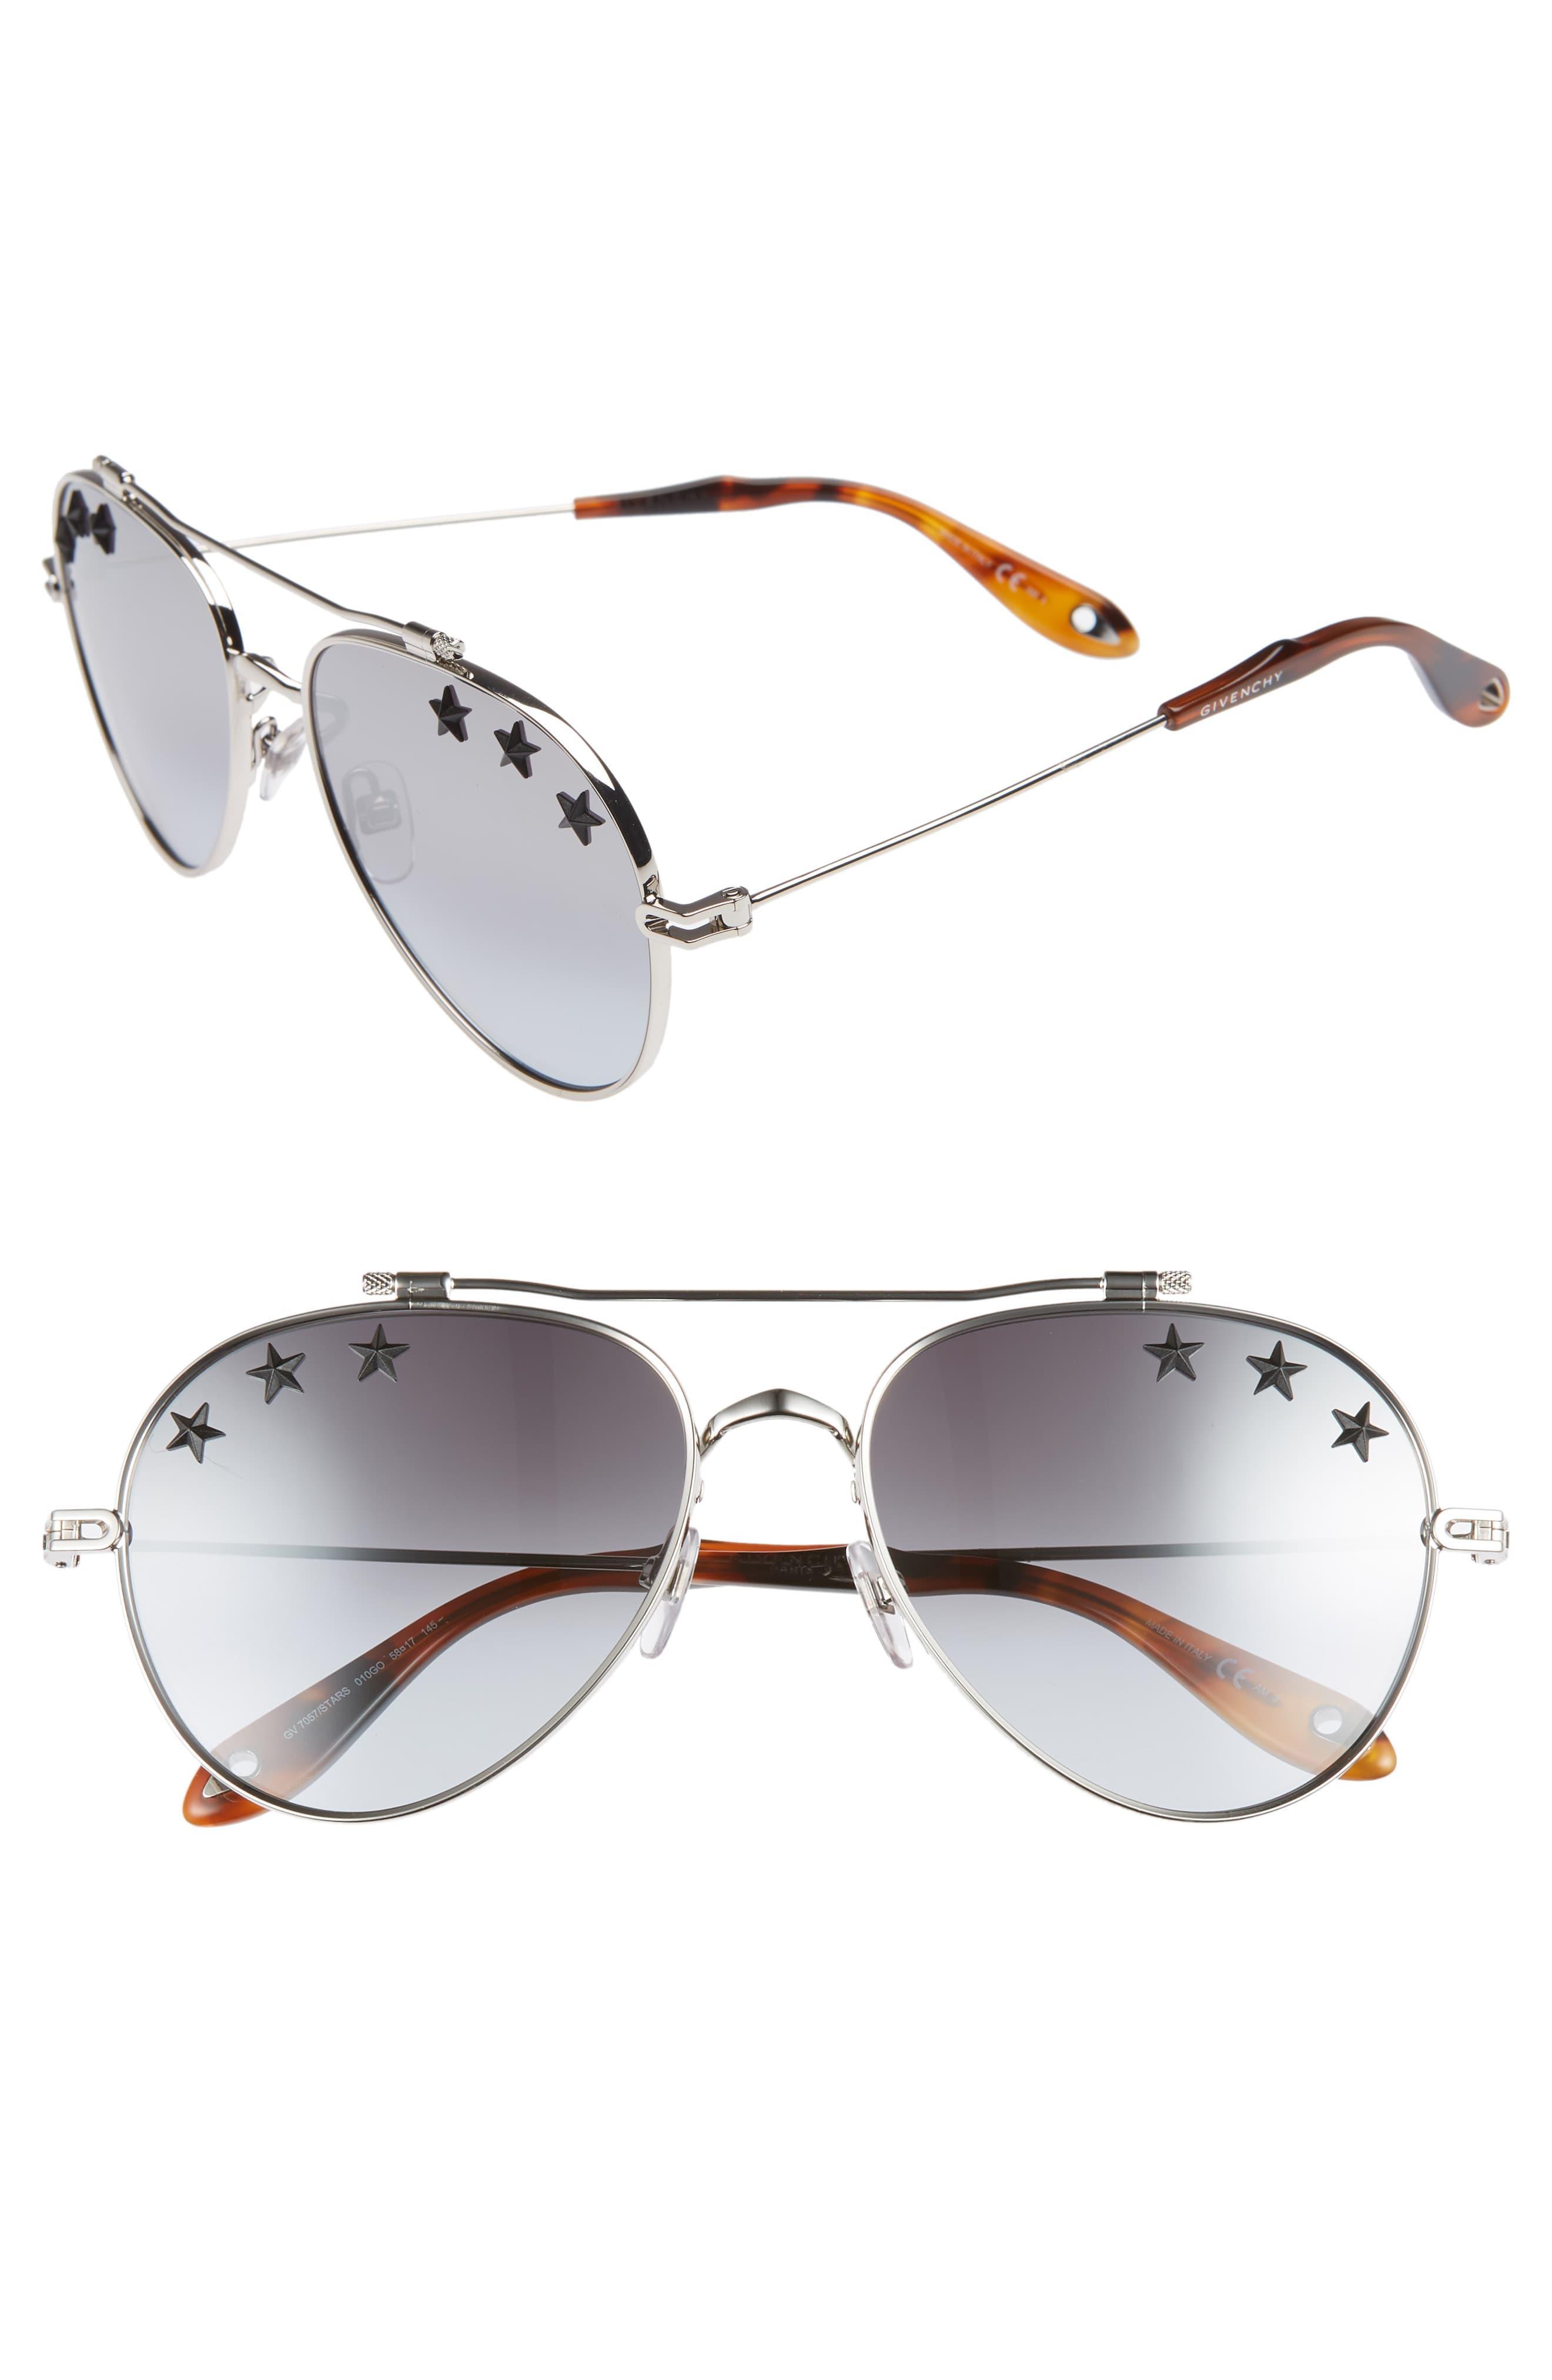 7f86f9fbfc79 ... Aviator Sunglasses - Palladium/ Grey Azure - Lyst. View fullscreen